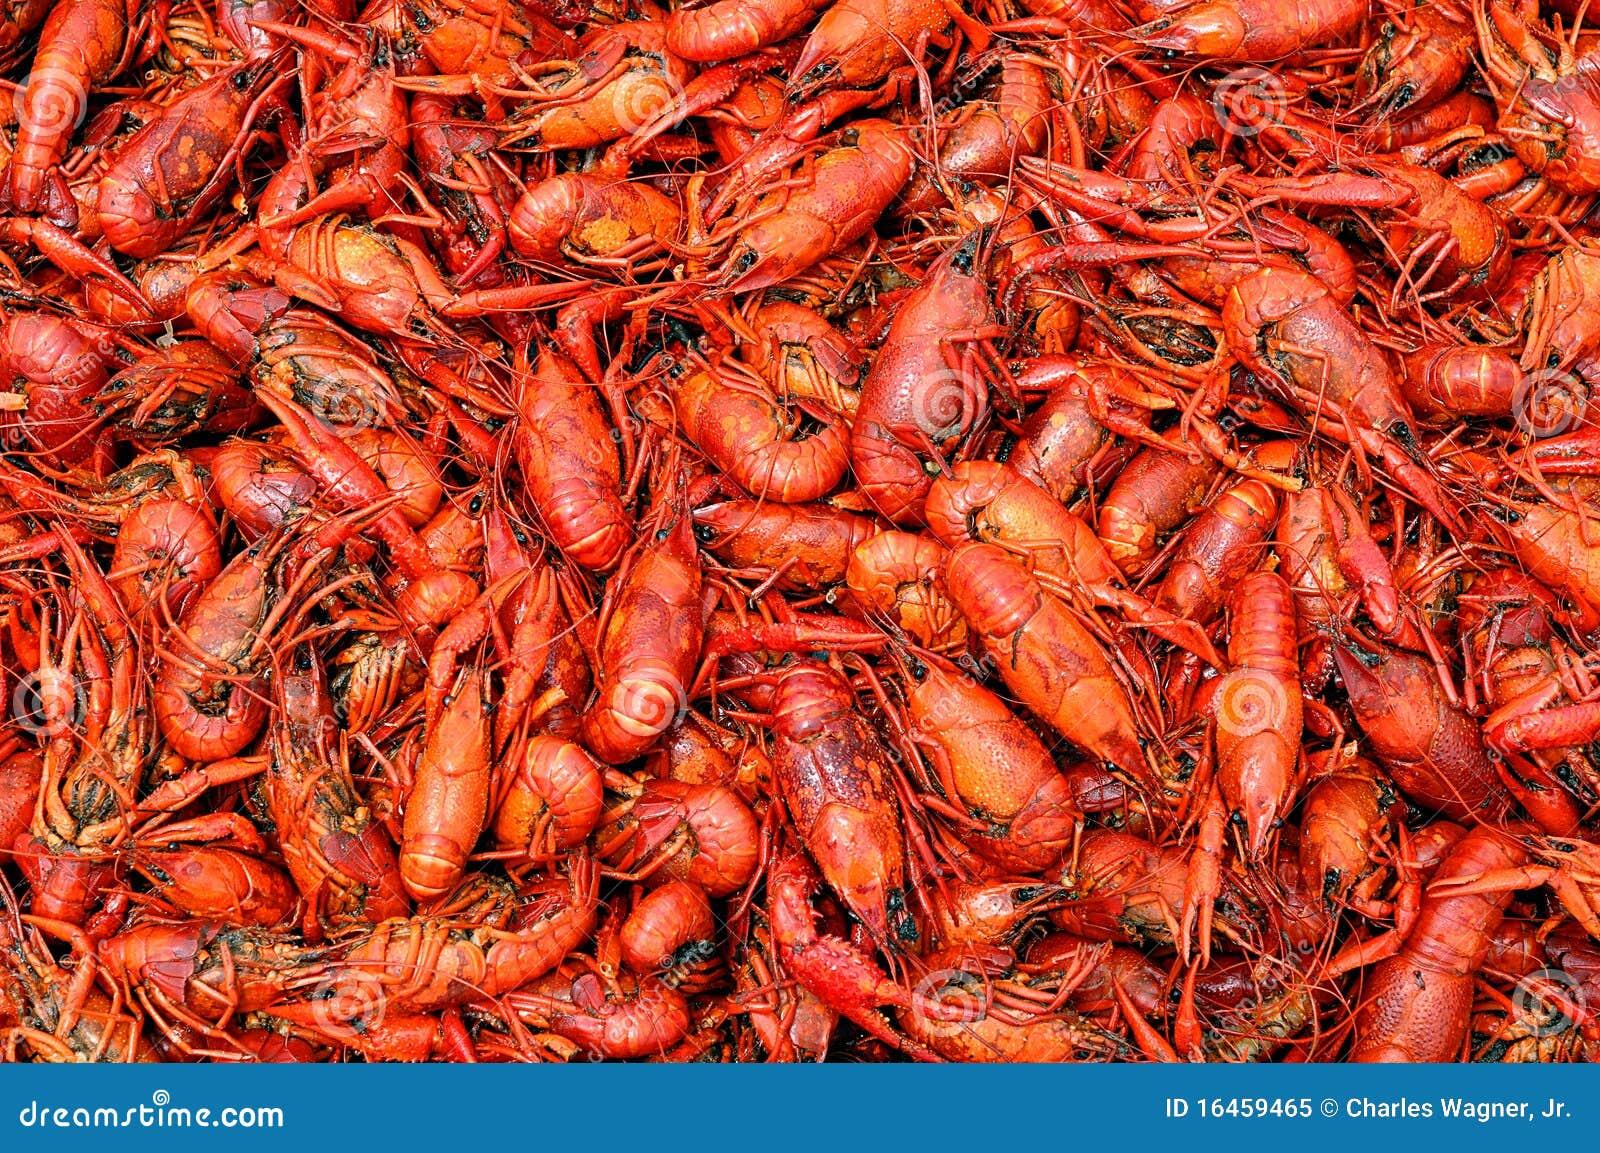 boiled crawfish royalty free stock photo image 16459465 Art Shrimp Boil Shrimp Clip Art